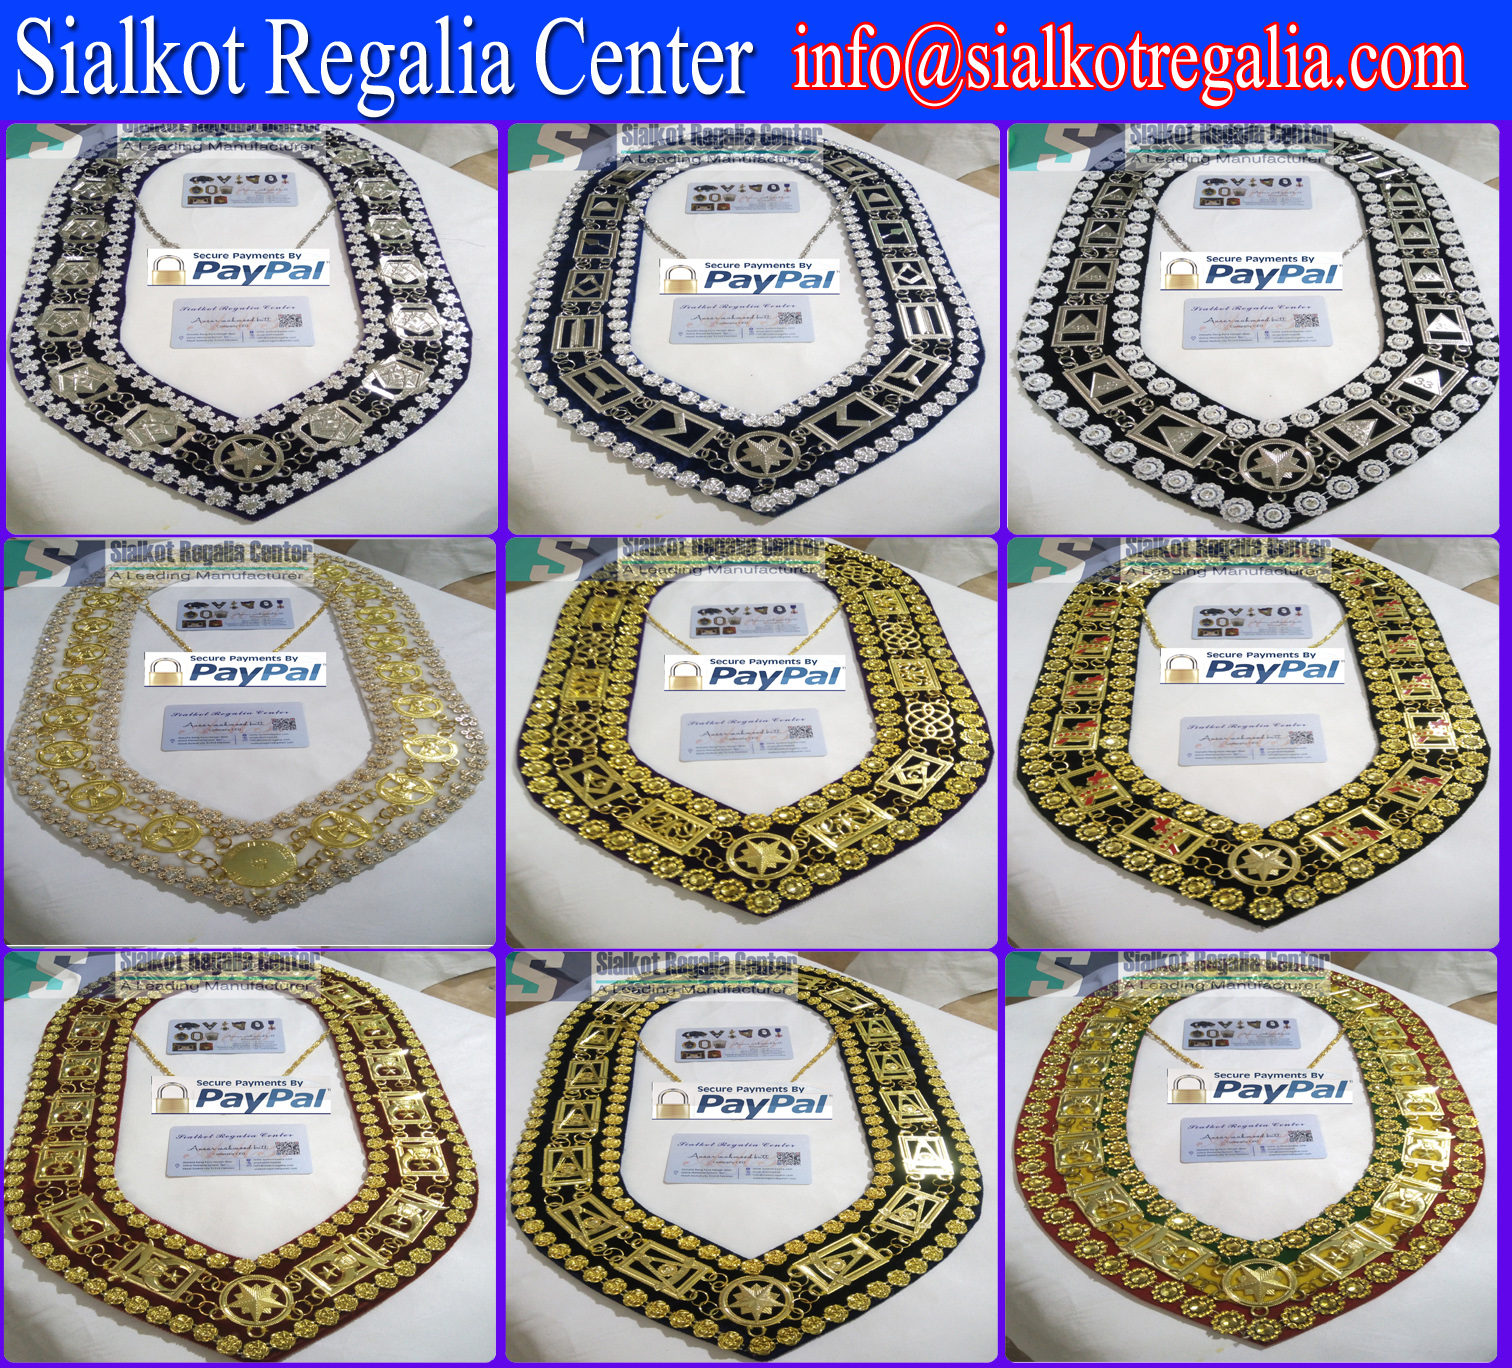 Masonic Collar GRAND LODGE METAL CHAIN DMR-100G Masonic Aprons & Regalia